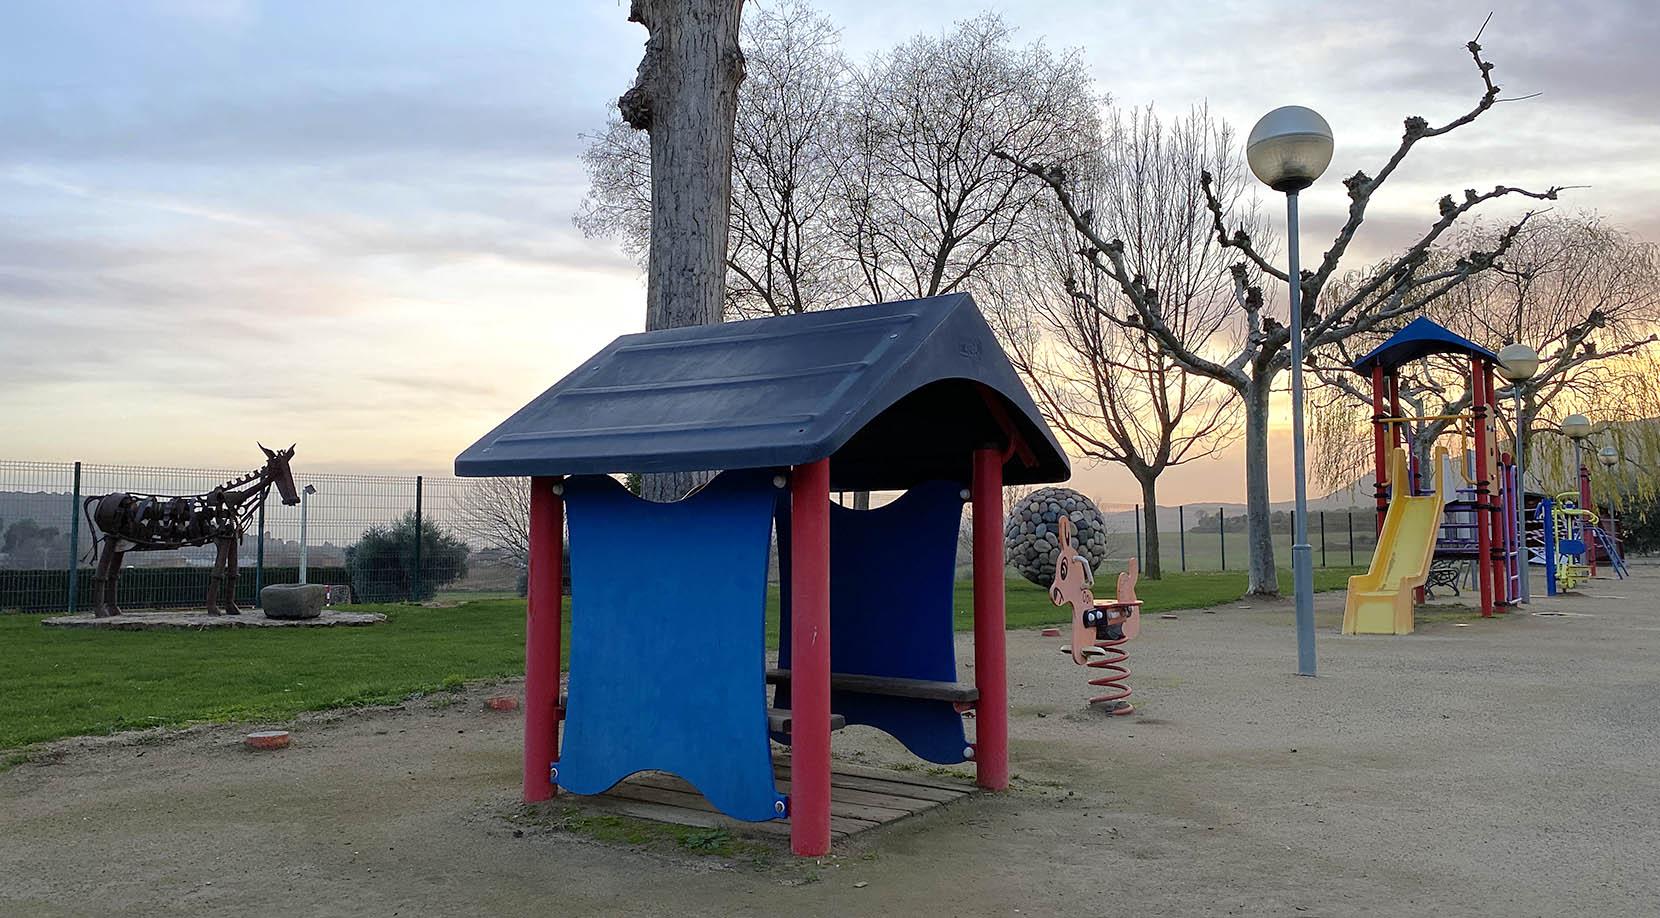 Zona de juegos infantiles exterior.